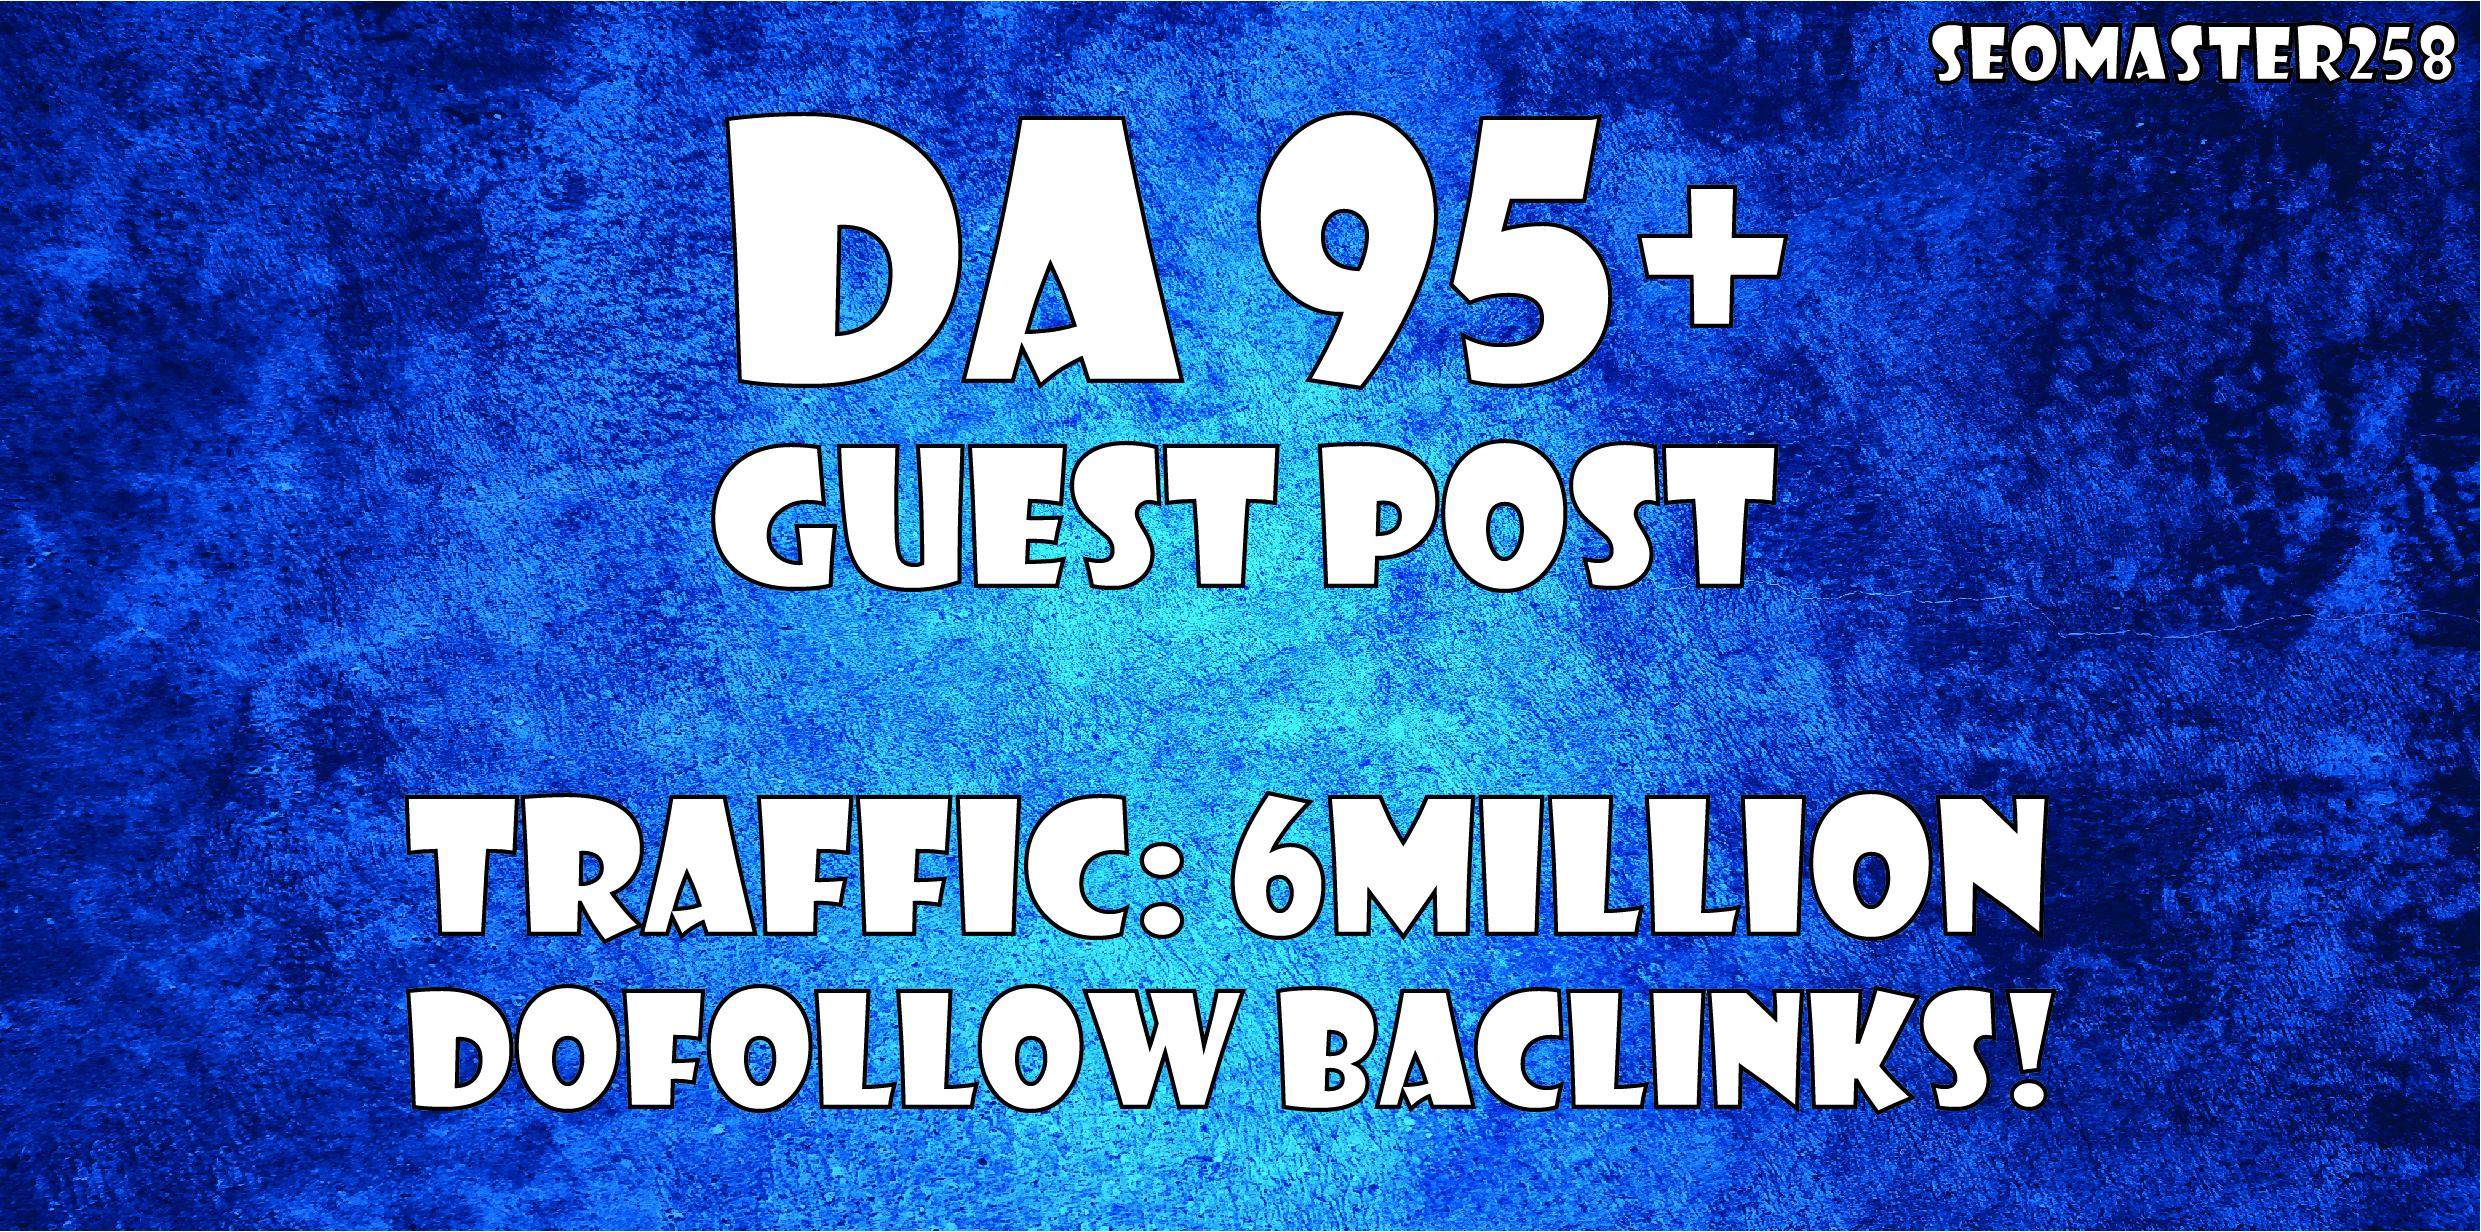 Build SEO Backlinks through High Da 90+ Guest Posts High Authority